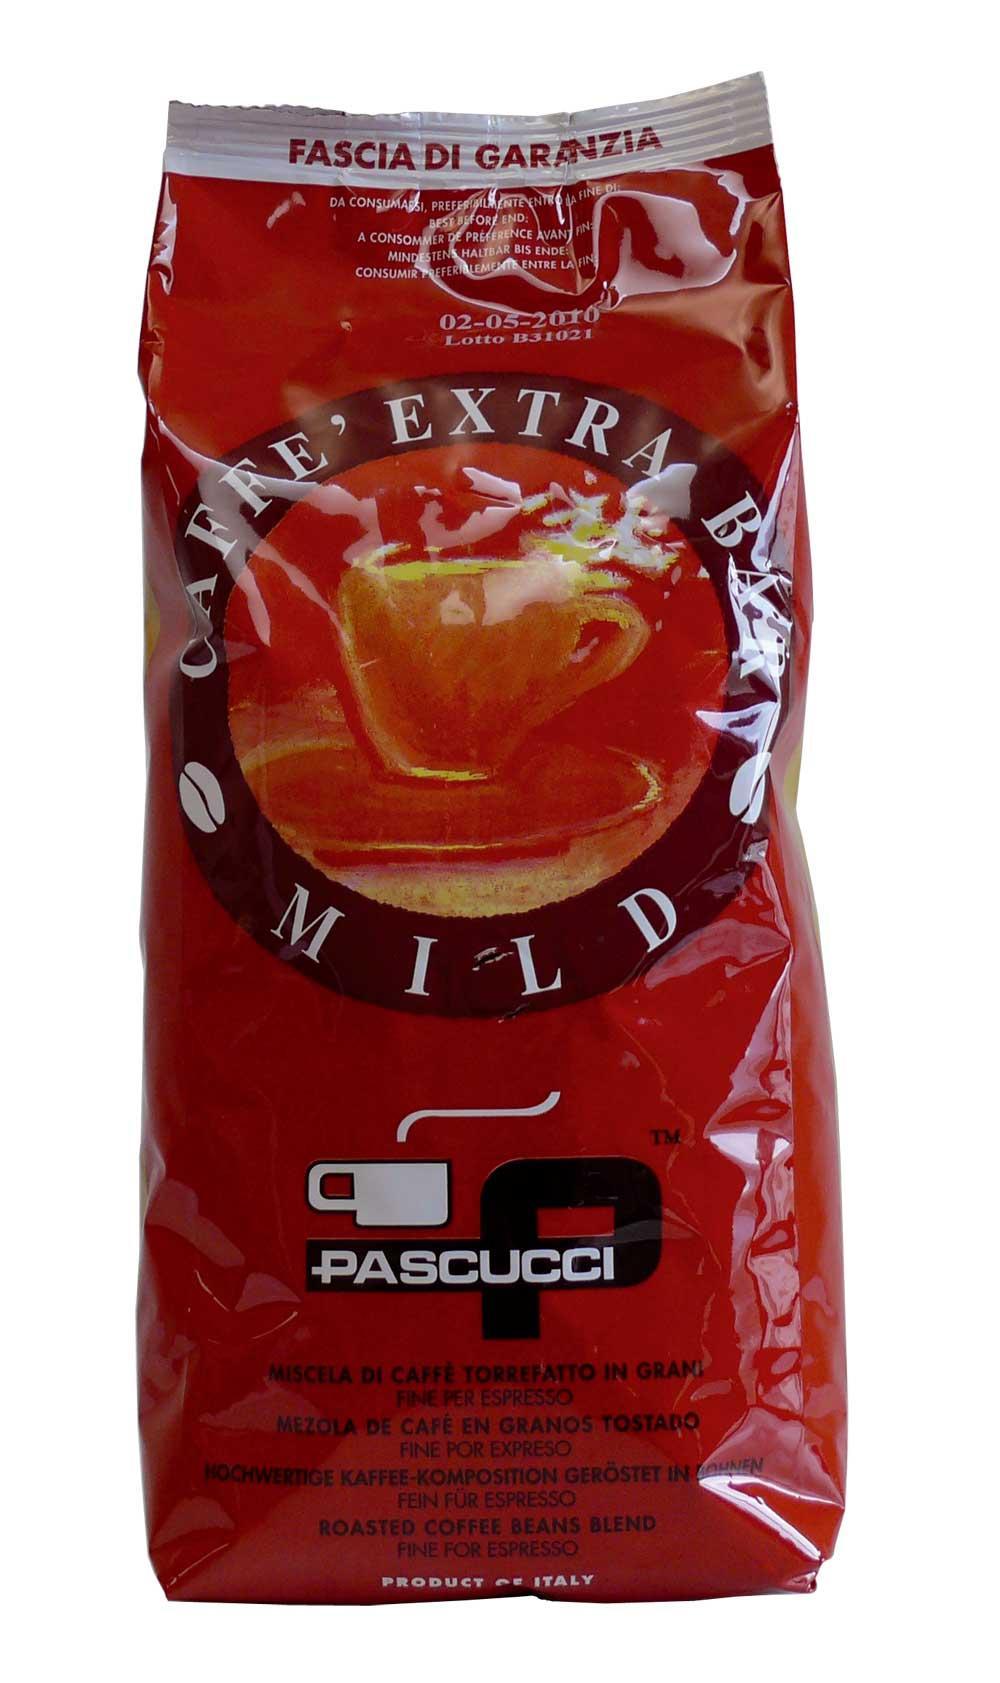 Pascucci Extra Bar Mild Caffé